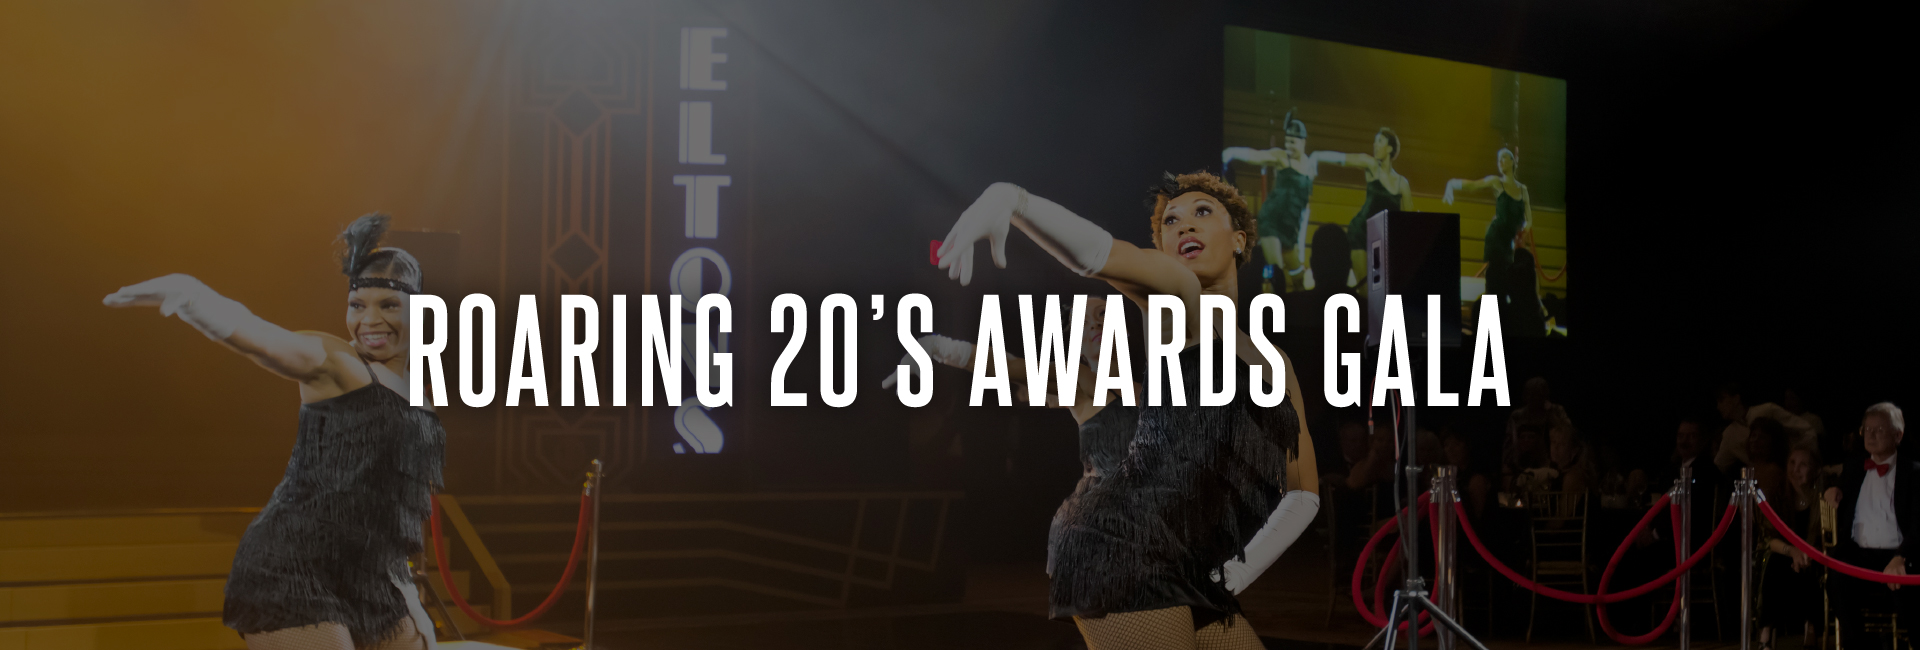 Roaring 20's Awards Gala